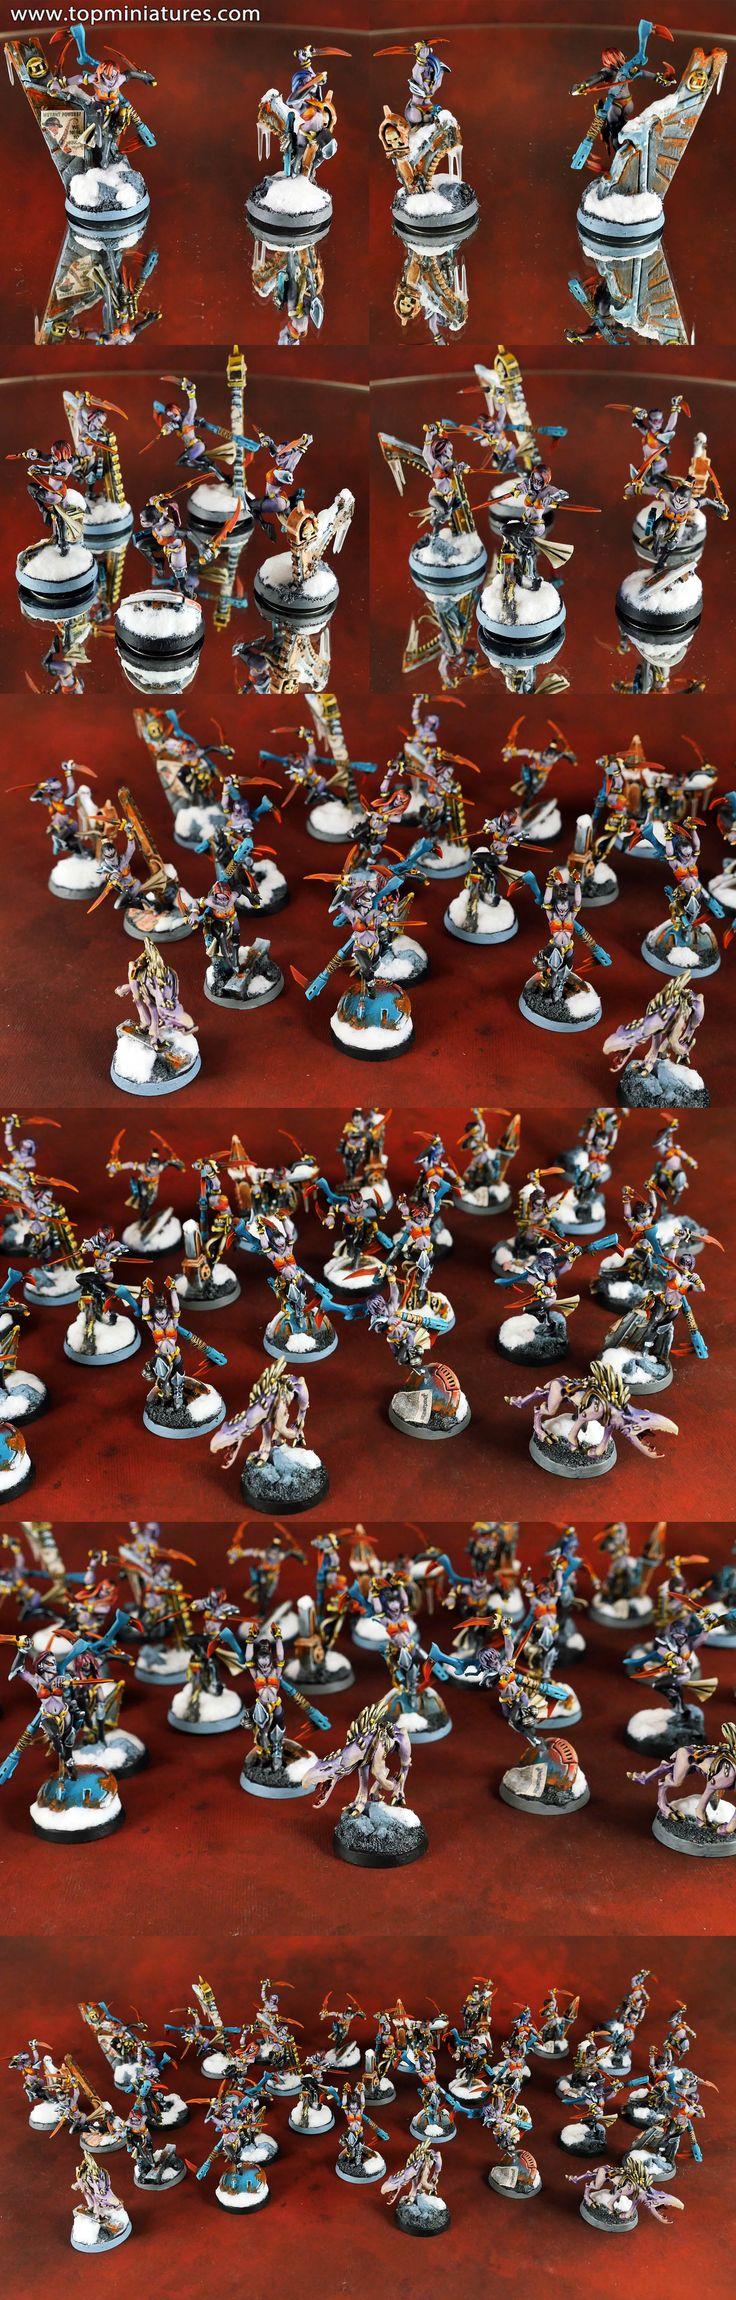 Warhammer 40k tau empire kroot females conversions